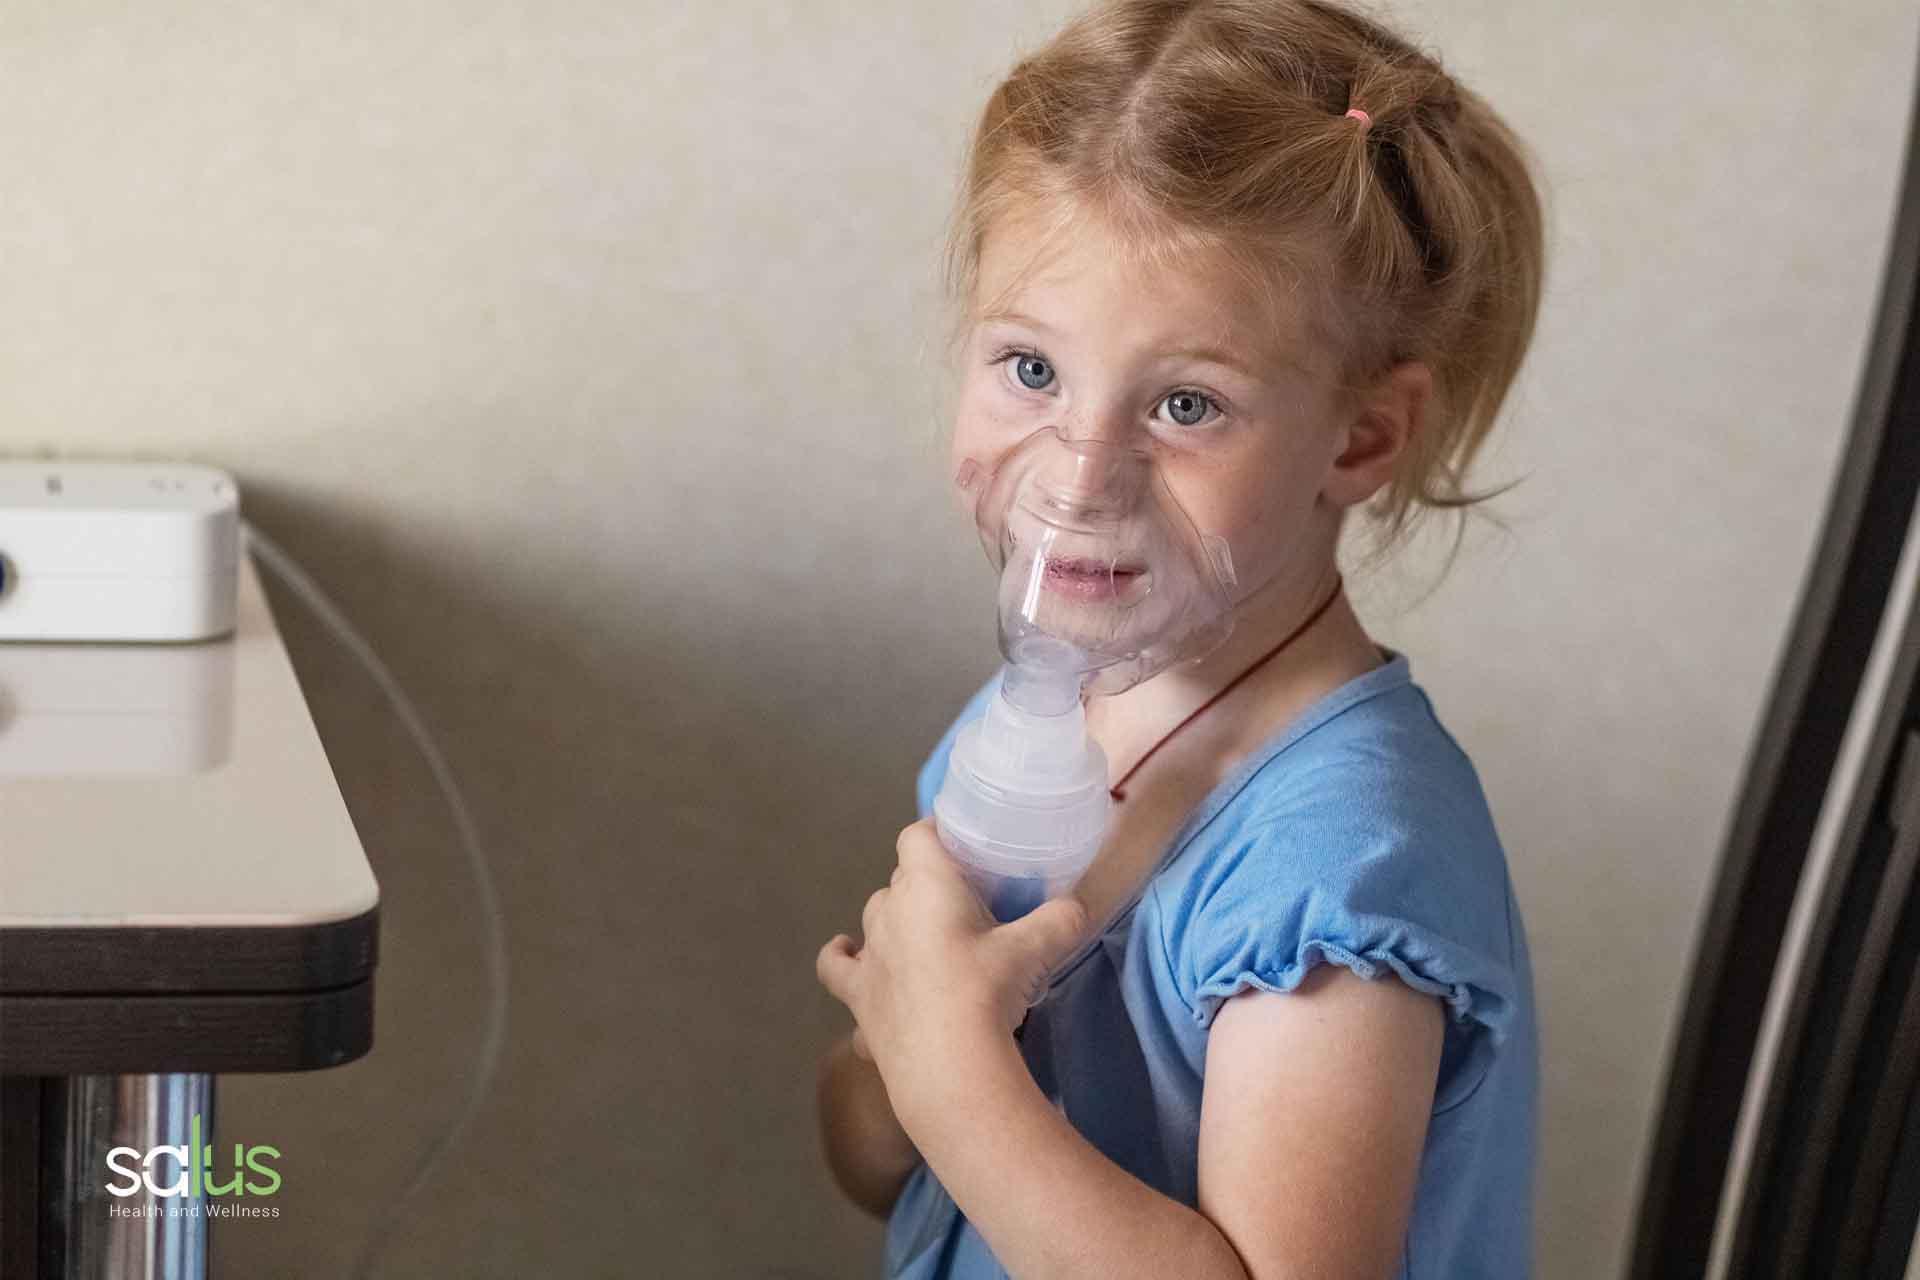 Salus Blog - tosse secca nei bambini